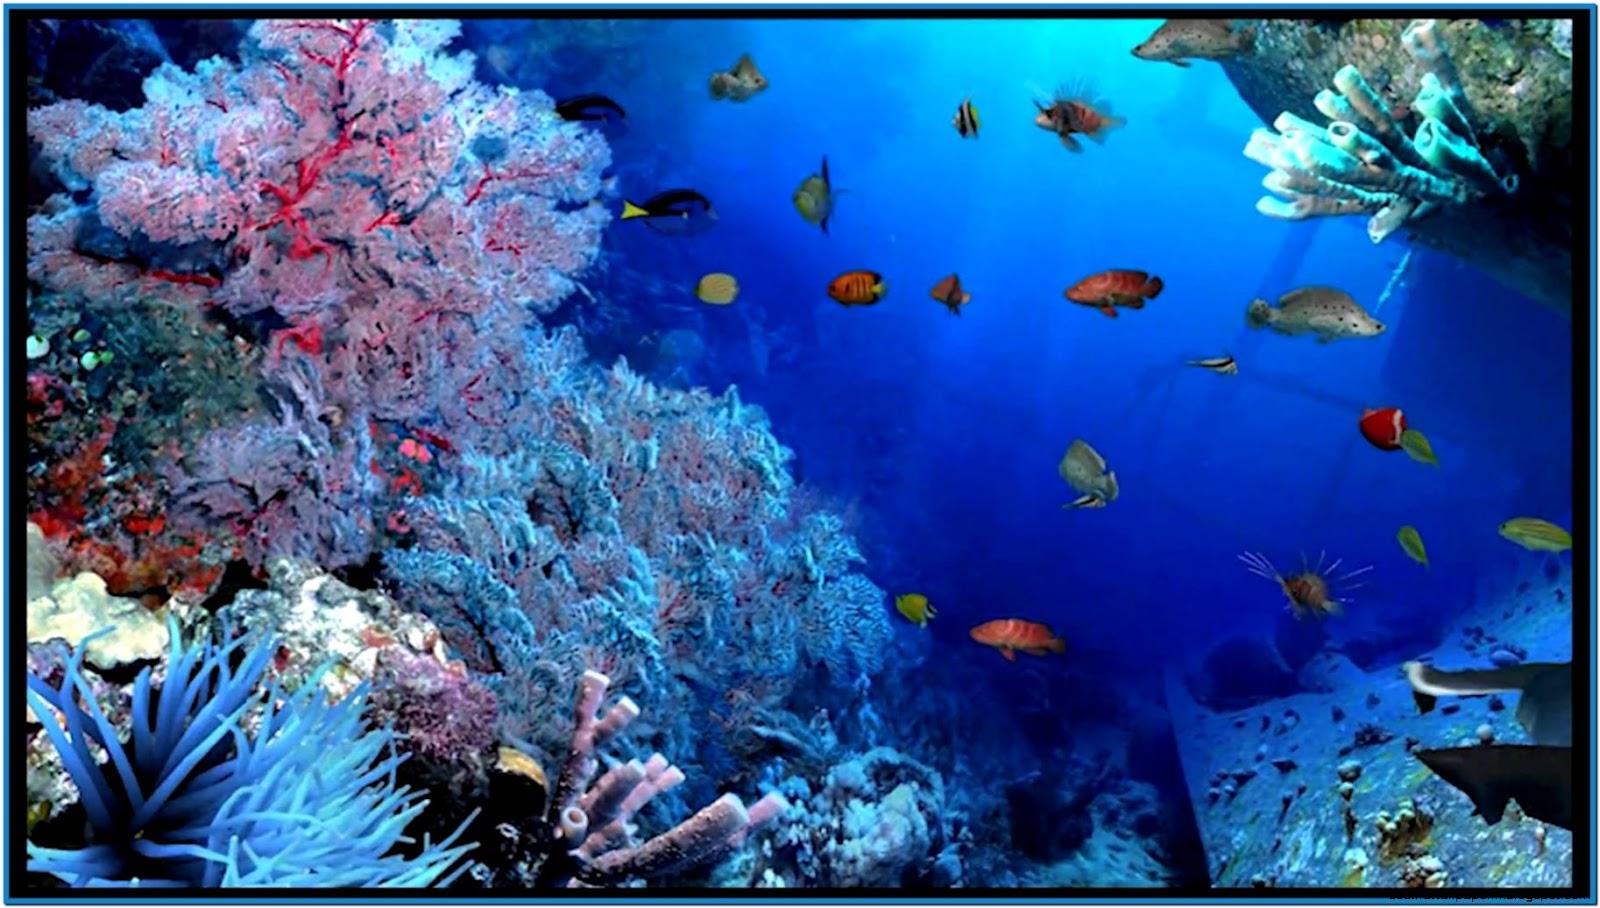 Animated Wallpaper Fish Aquarium Aquarium Screensavers 3d Wallpaper Best Hd Wallpapers